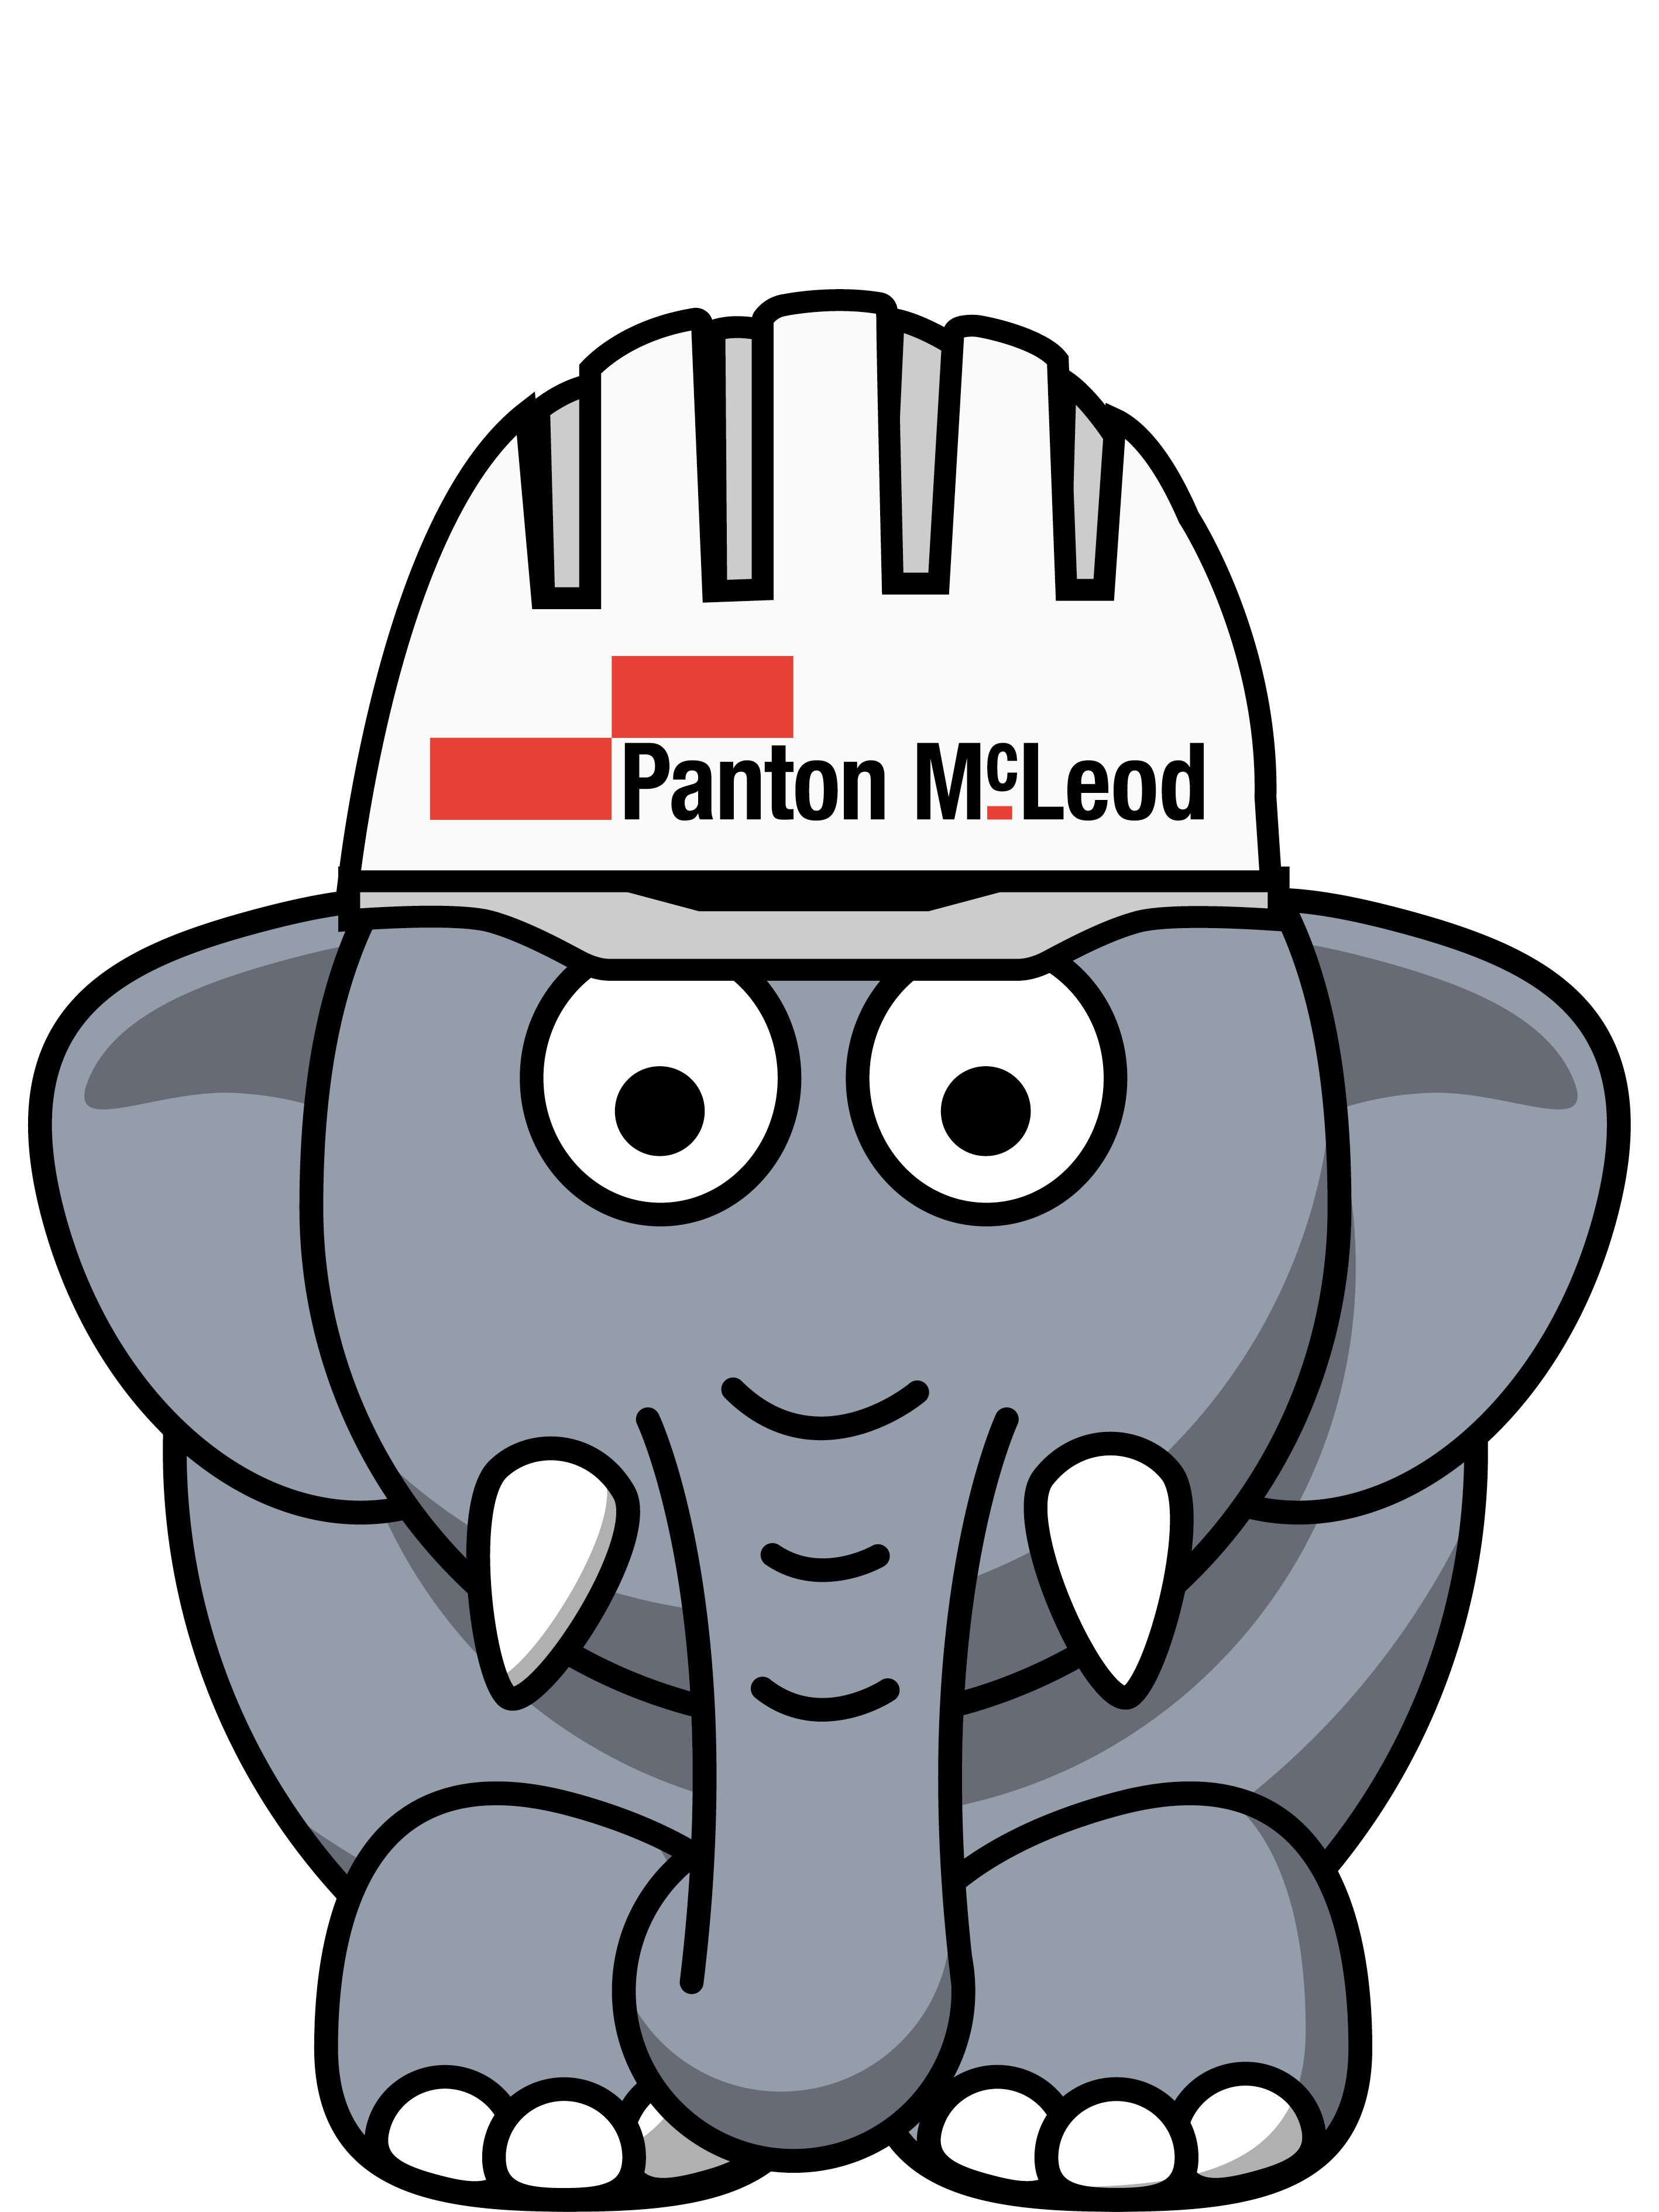 Eddy McLeod Emoji